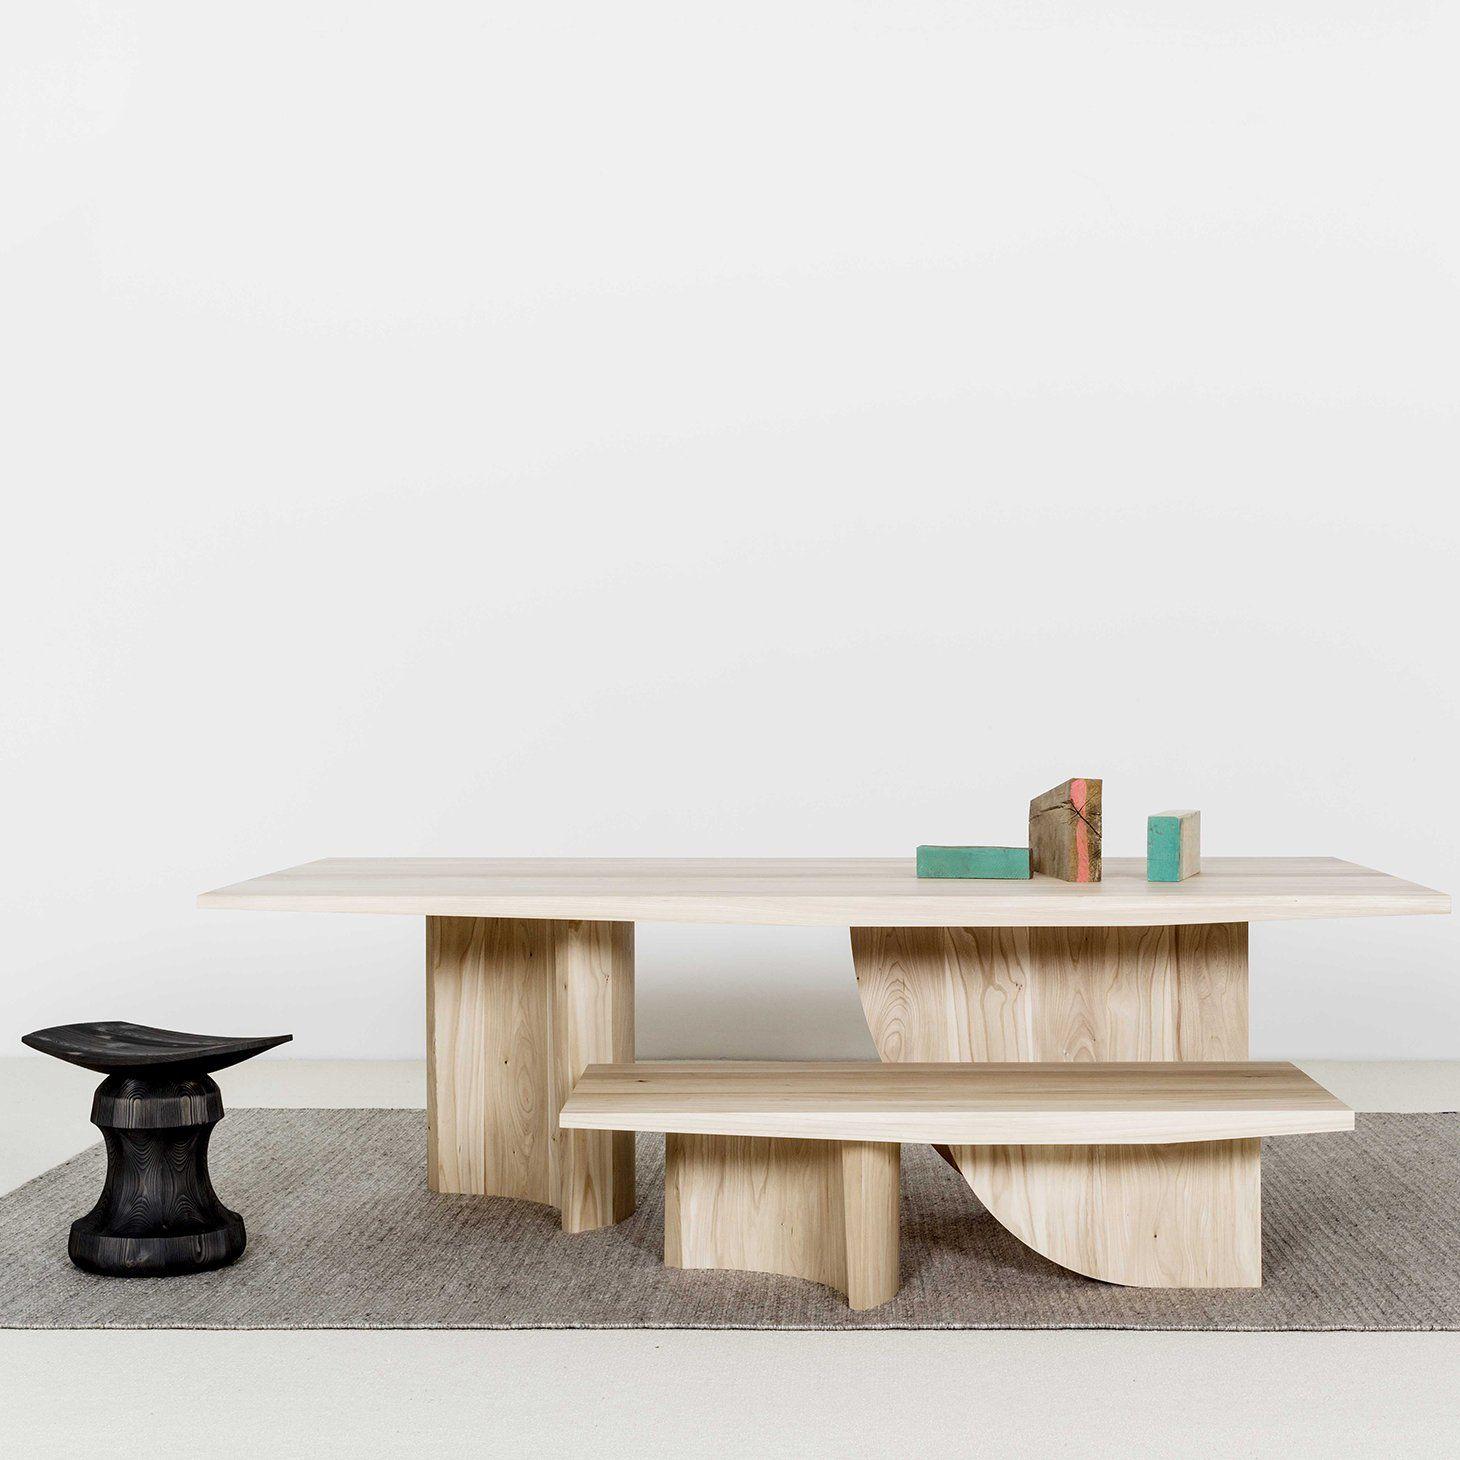 Teo Table Tables Christophe Delcourt Designer Furniture Sku 008 230 10463 Coffee Table Table Low Coffee Table [ 1460 x 1460 Pixel ]